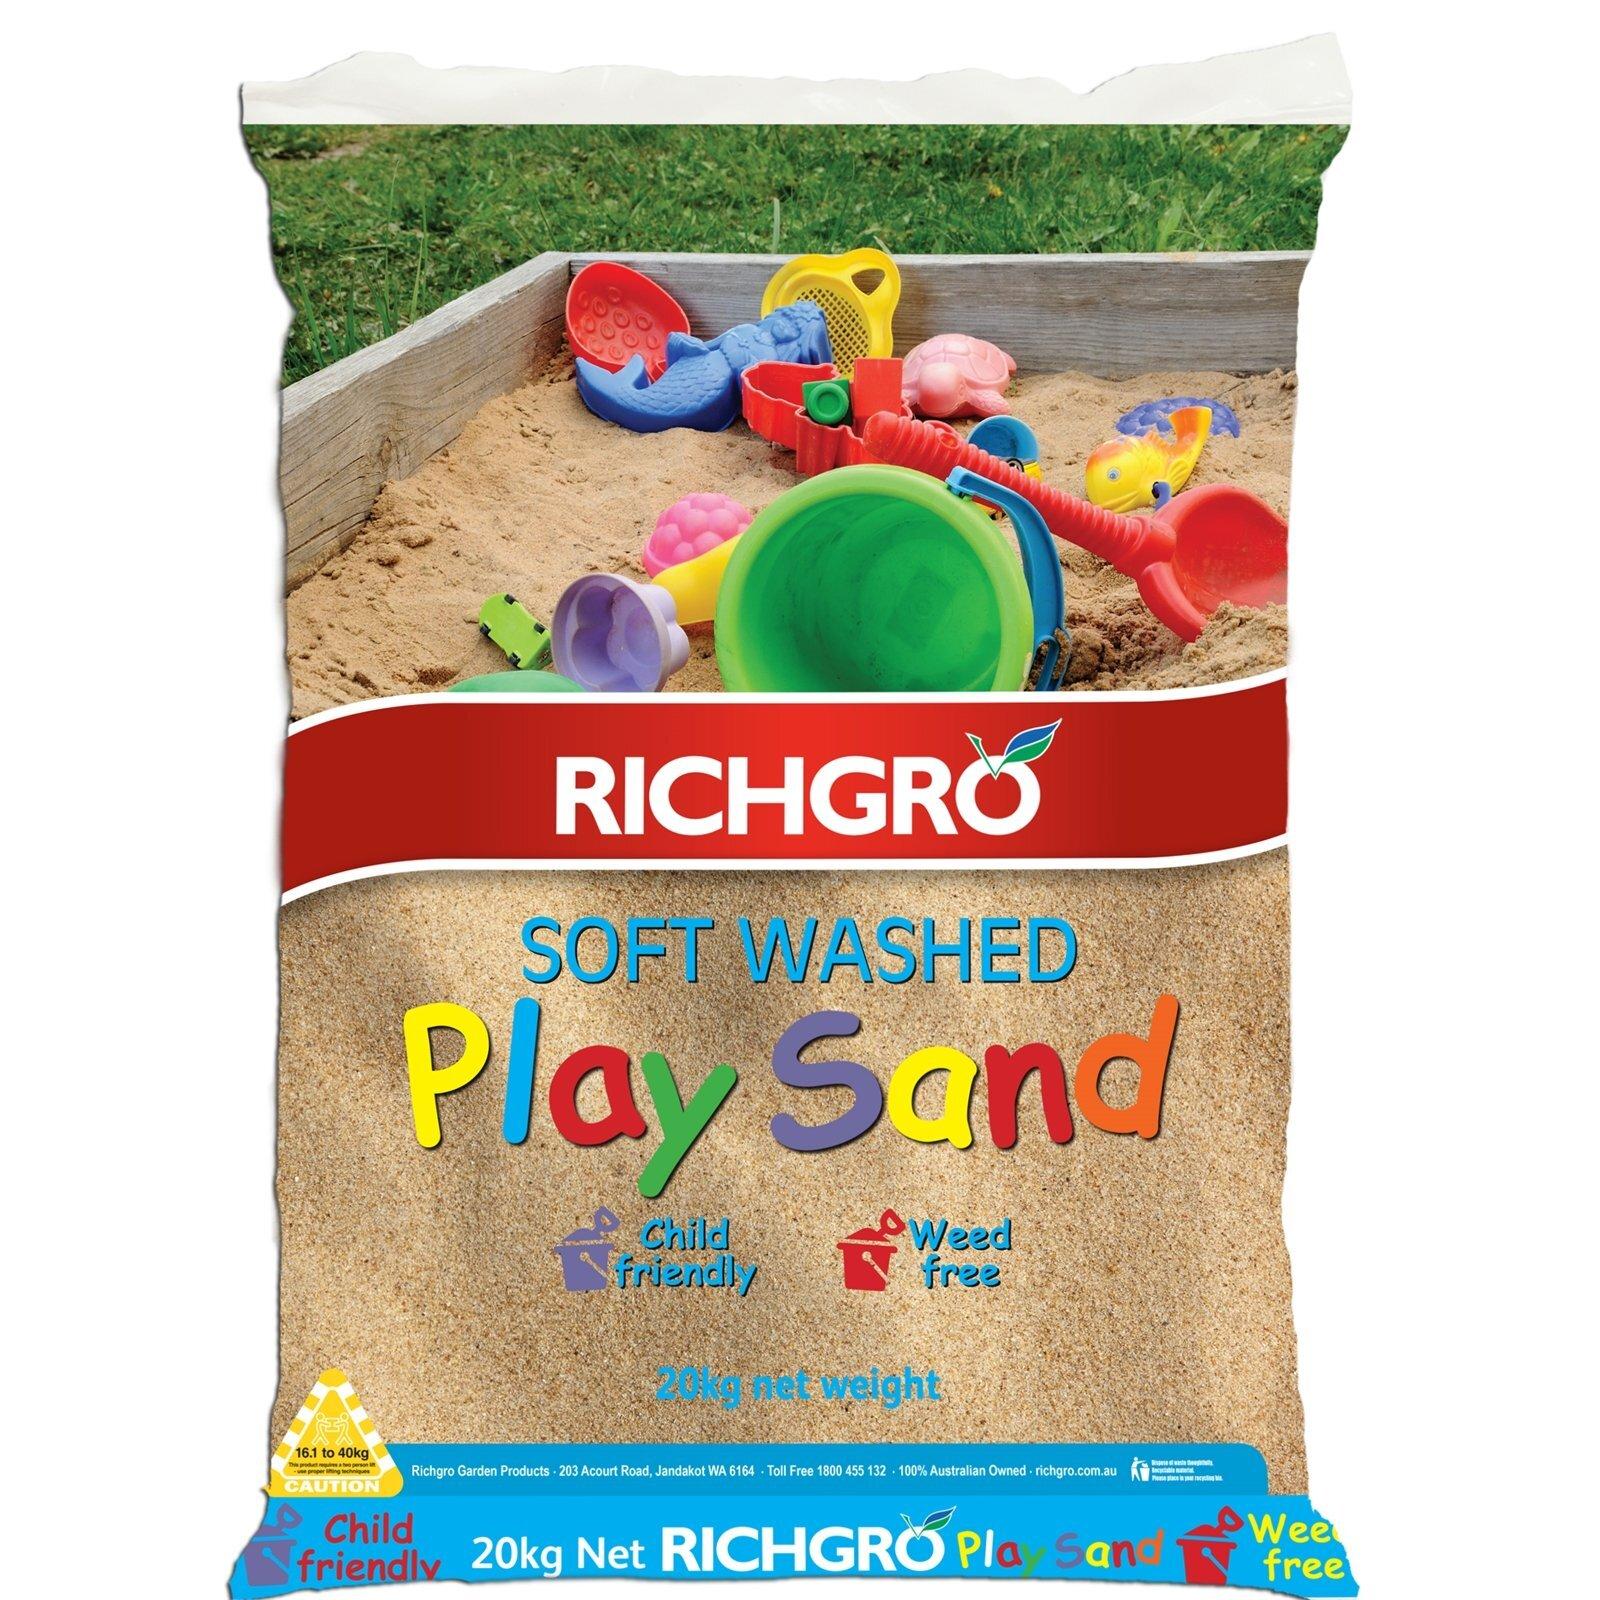 Richgro 20kg Play Sand